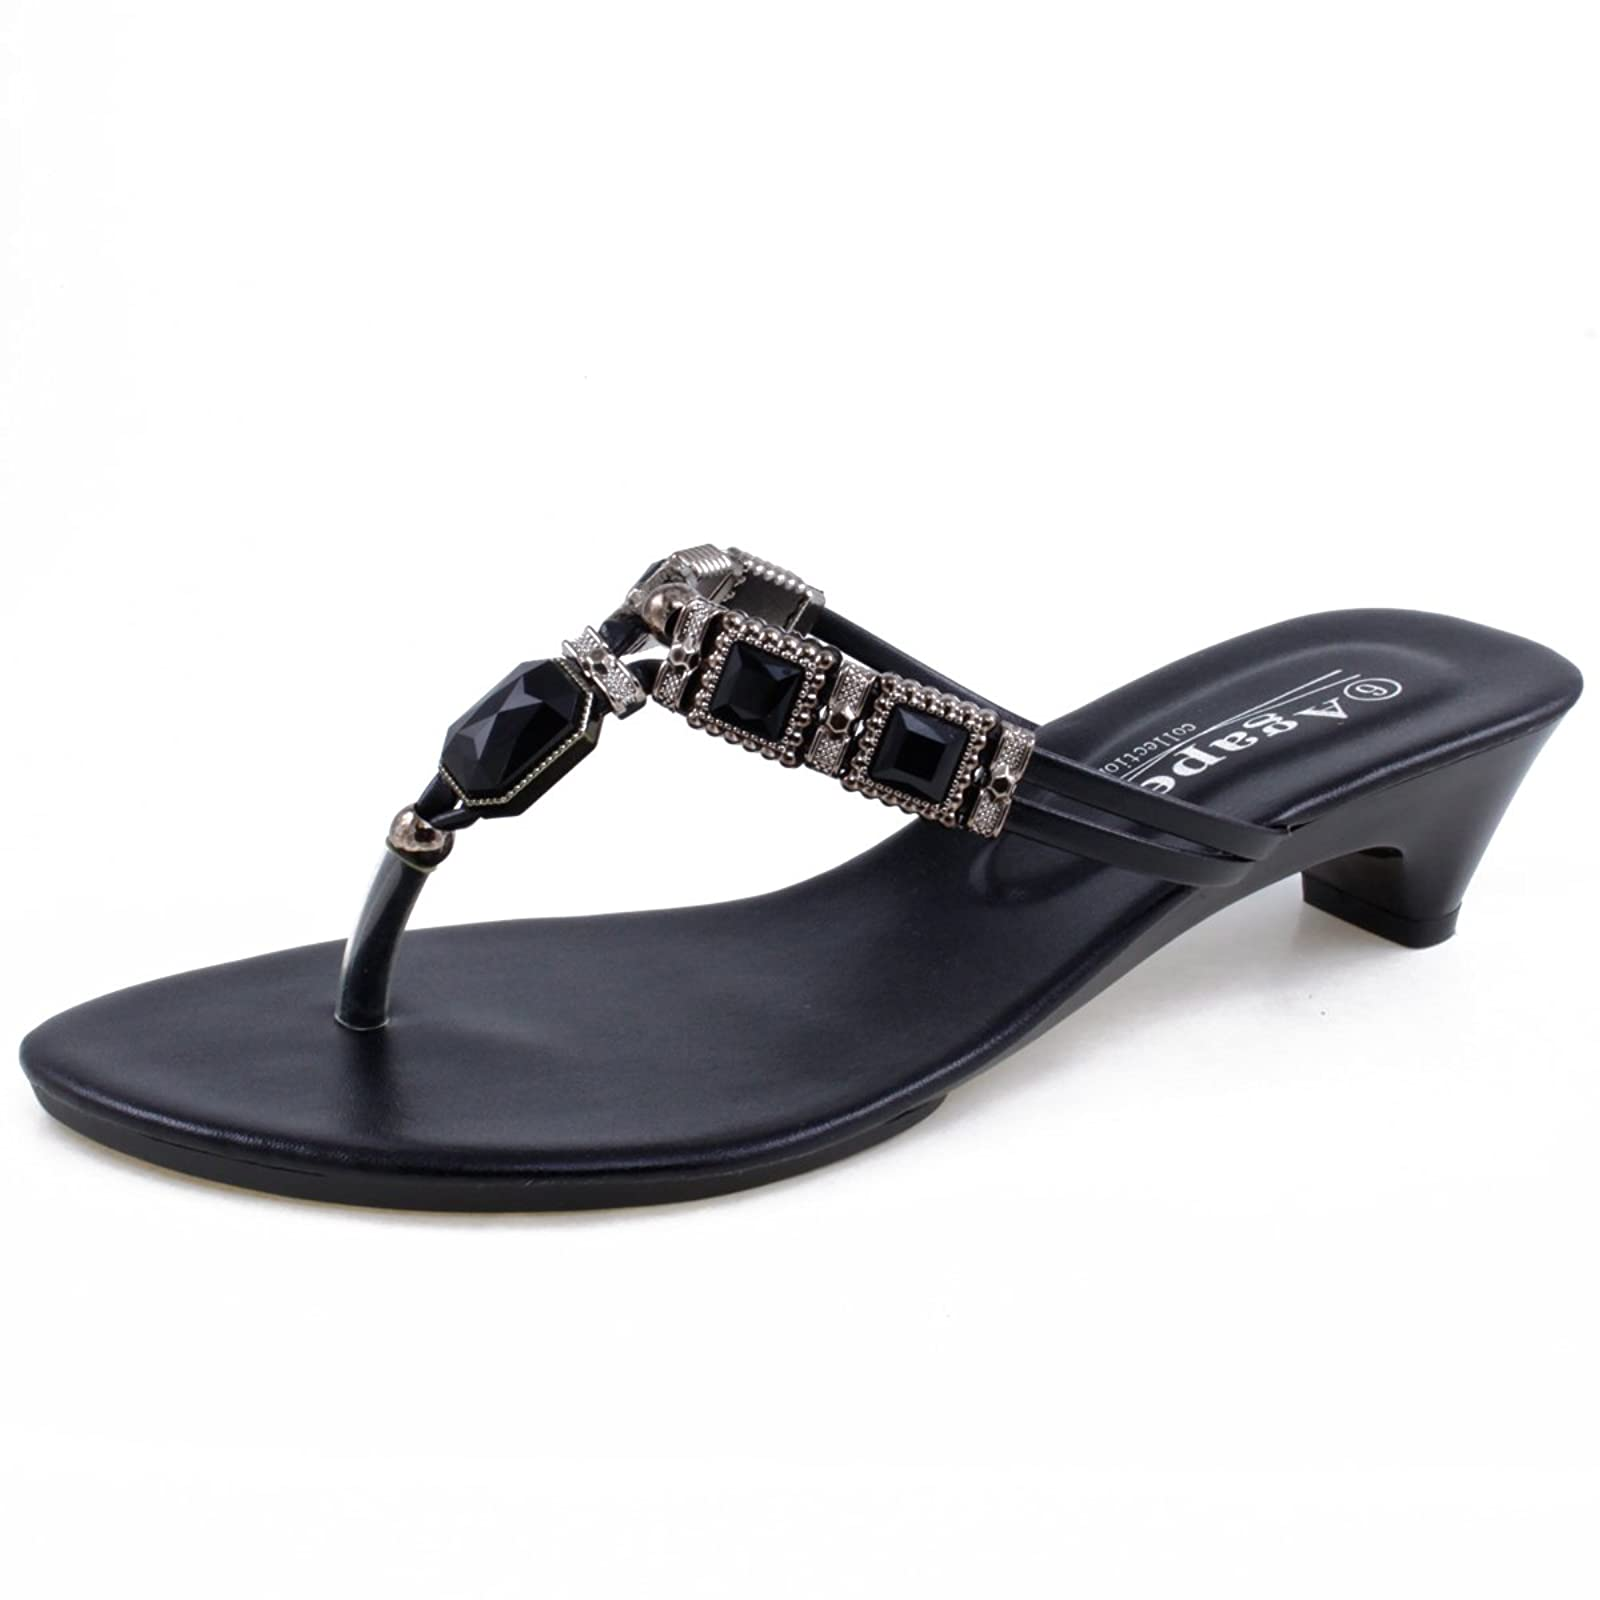 2088ab125c4f1 Agape VEGA-16 Jeweled Thong Low Heel Large